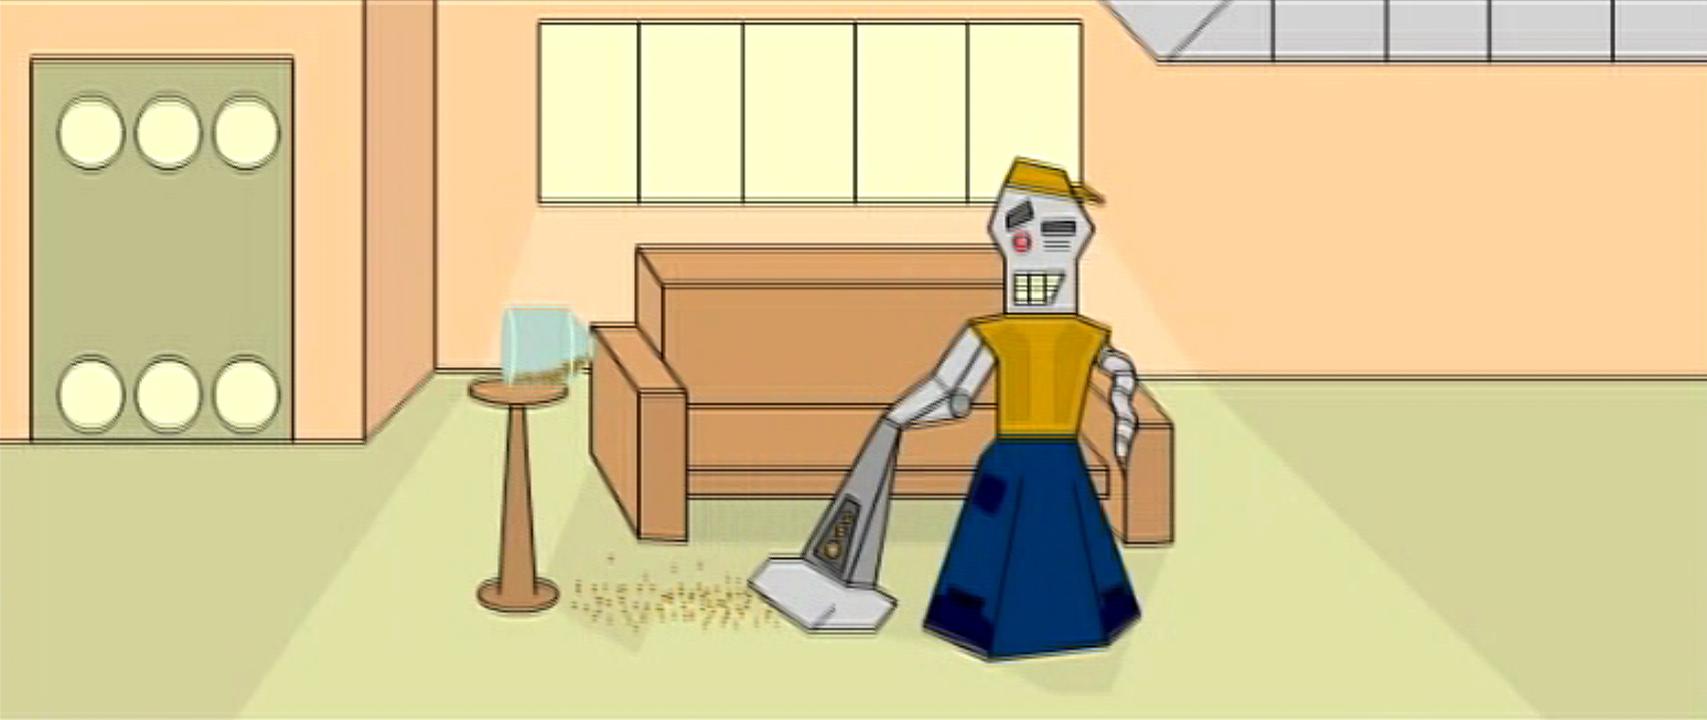 Humorous Vacuum Robot